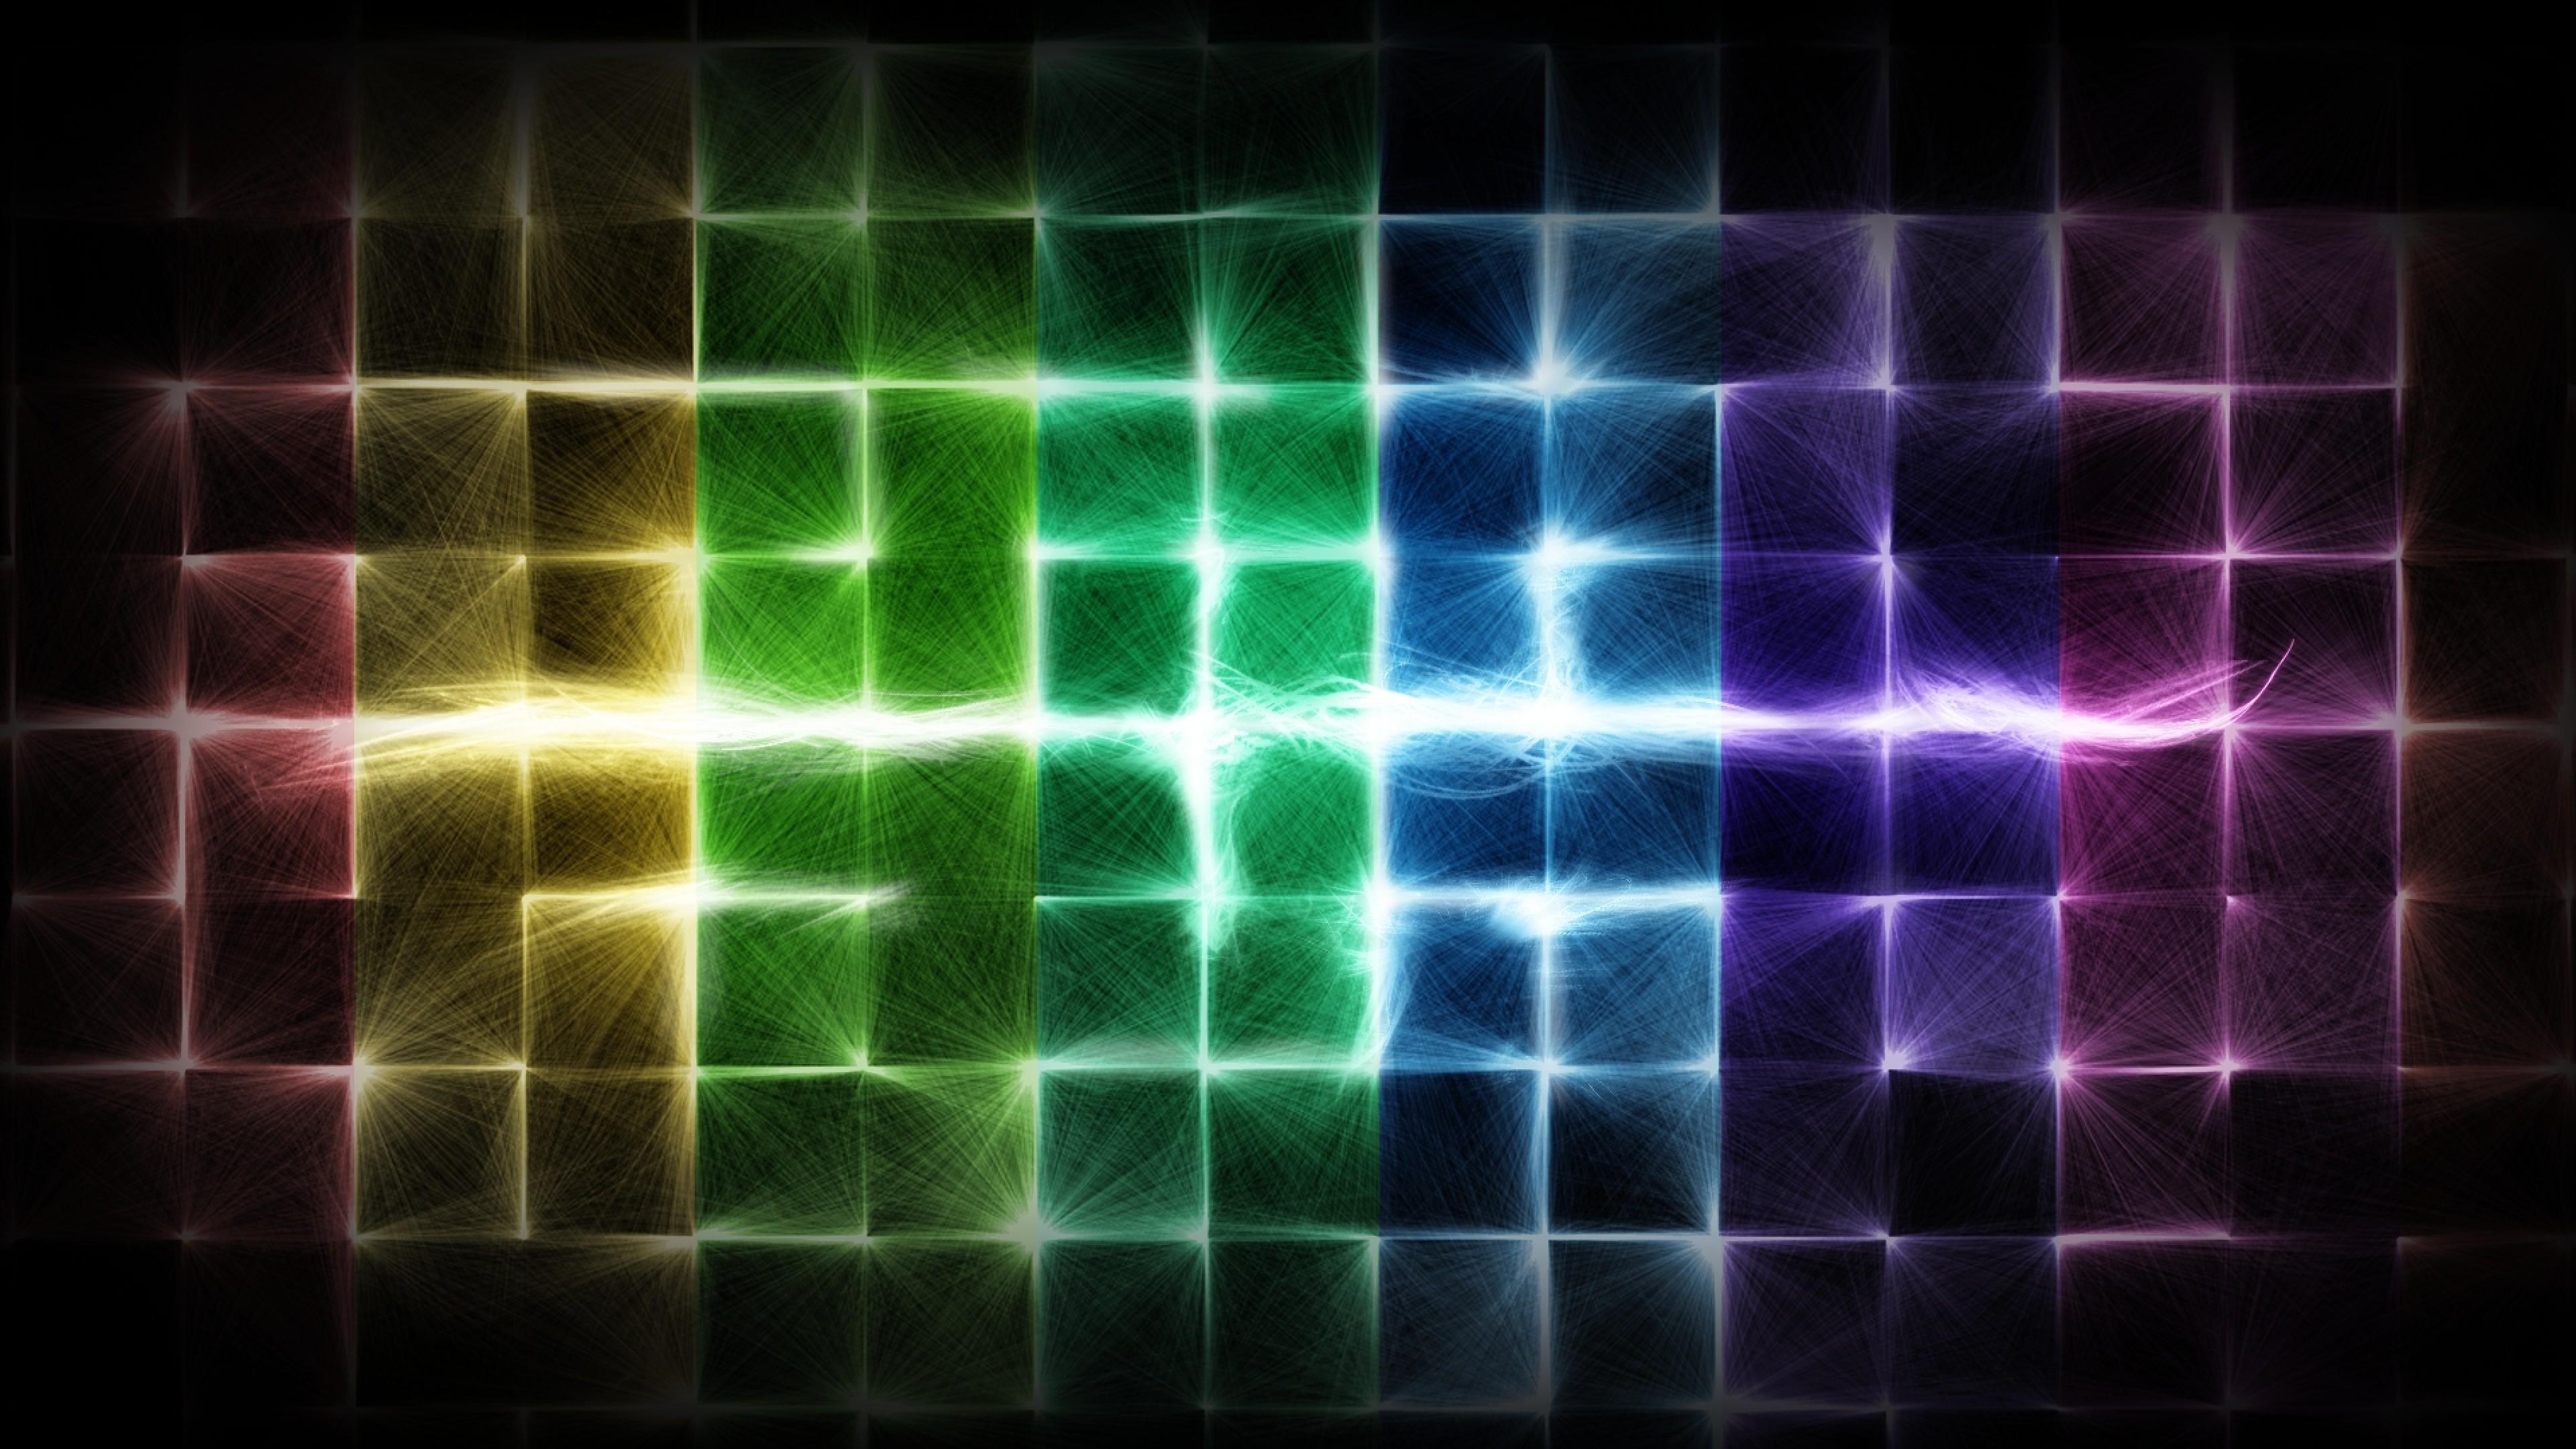 Wallpaper colorful, cells, light, shine, bright